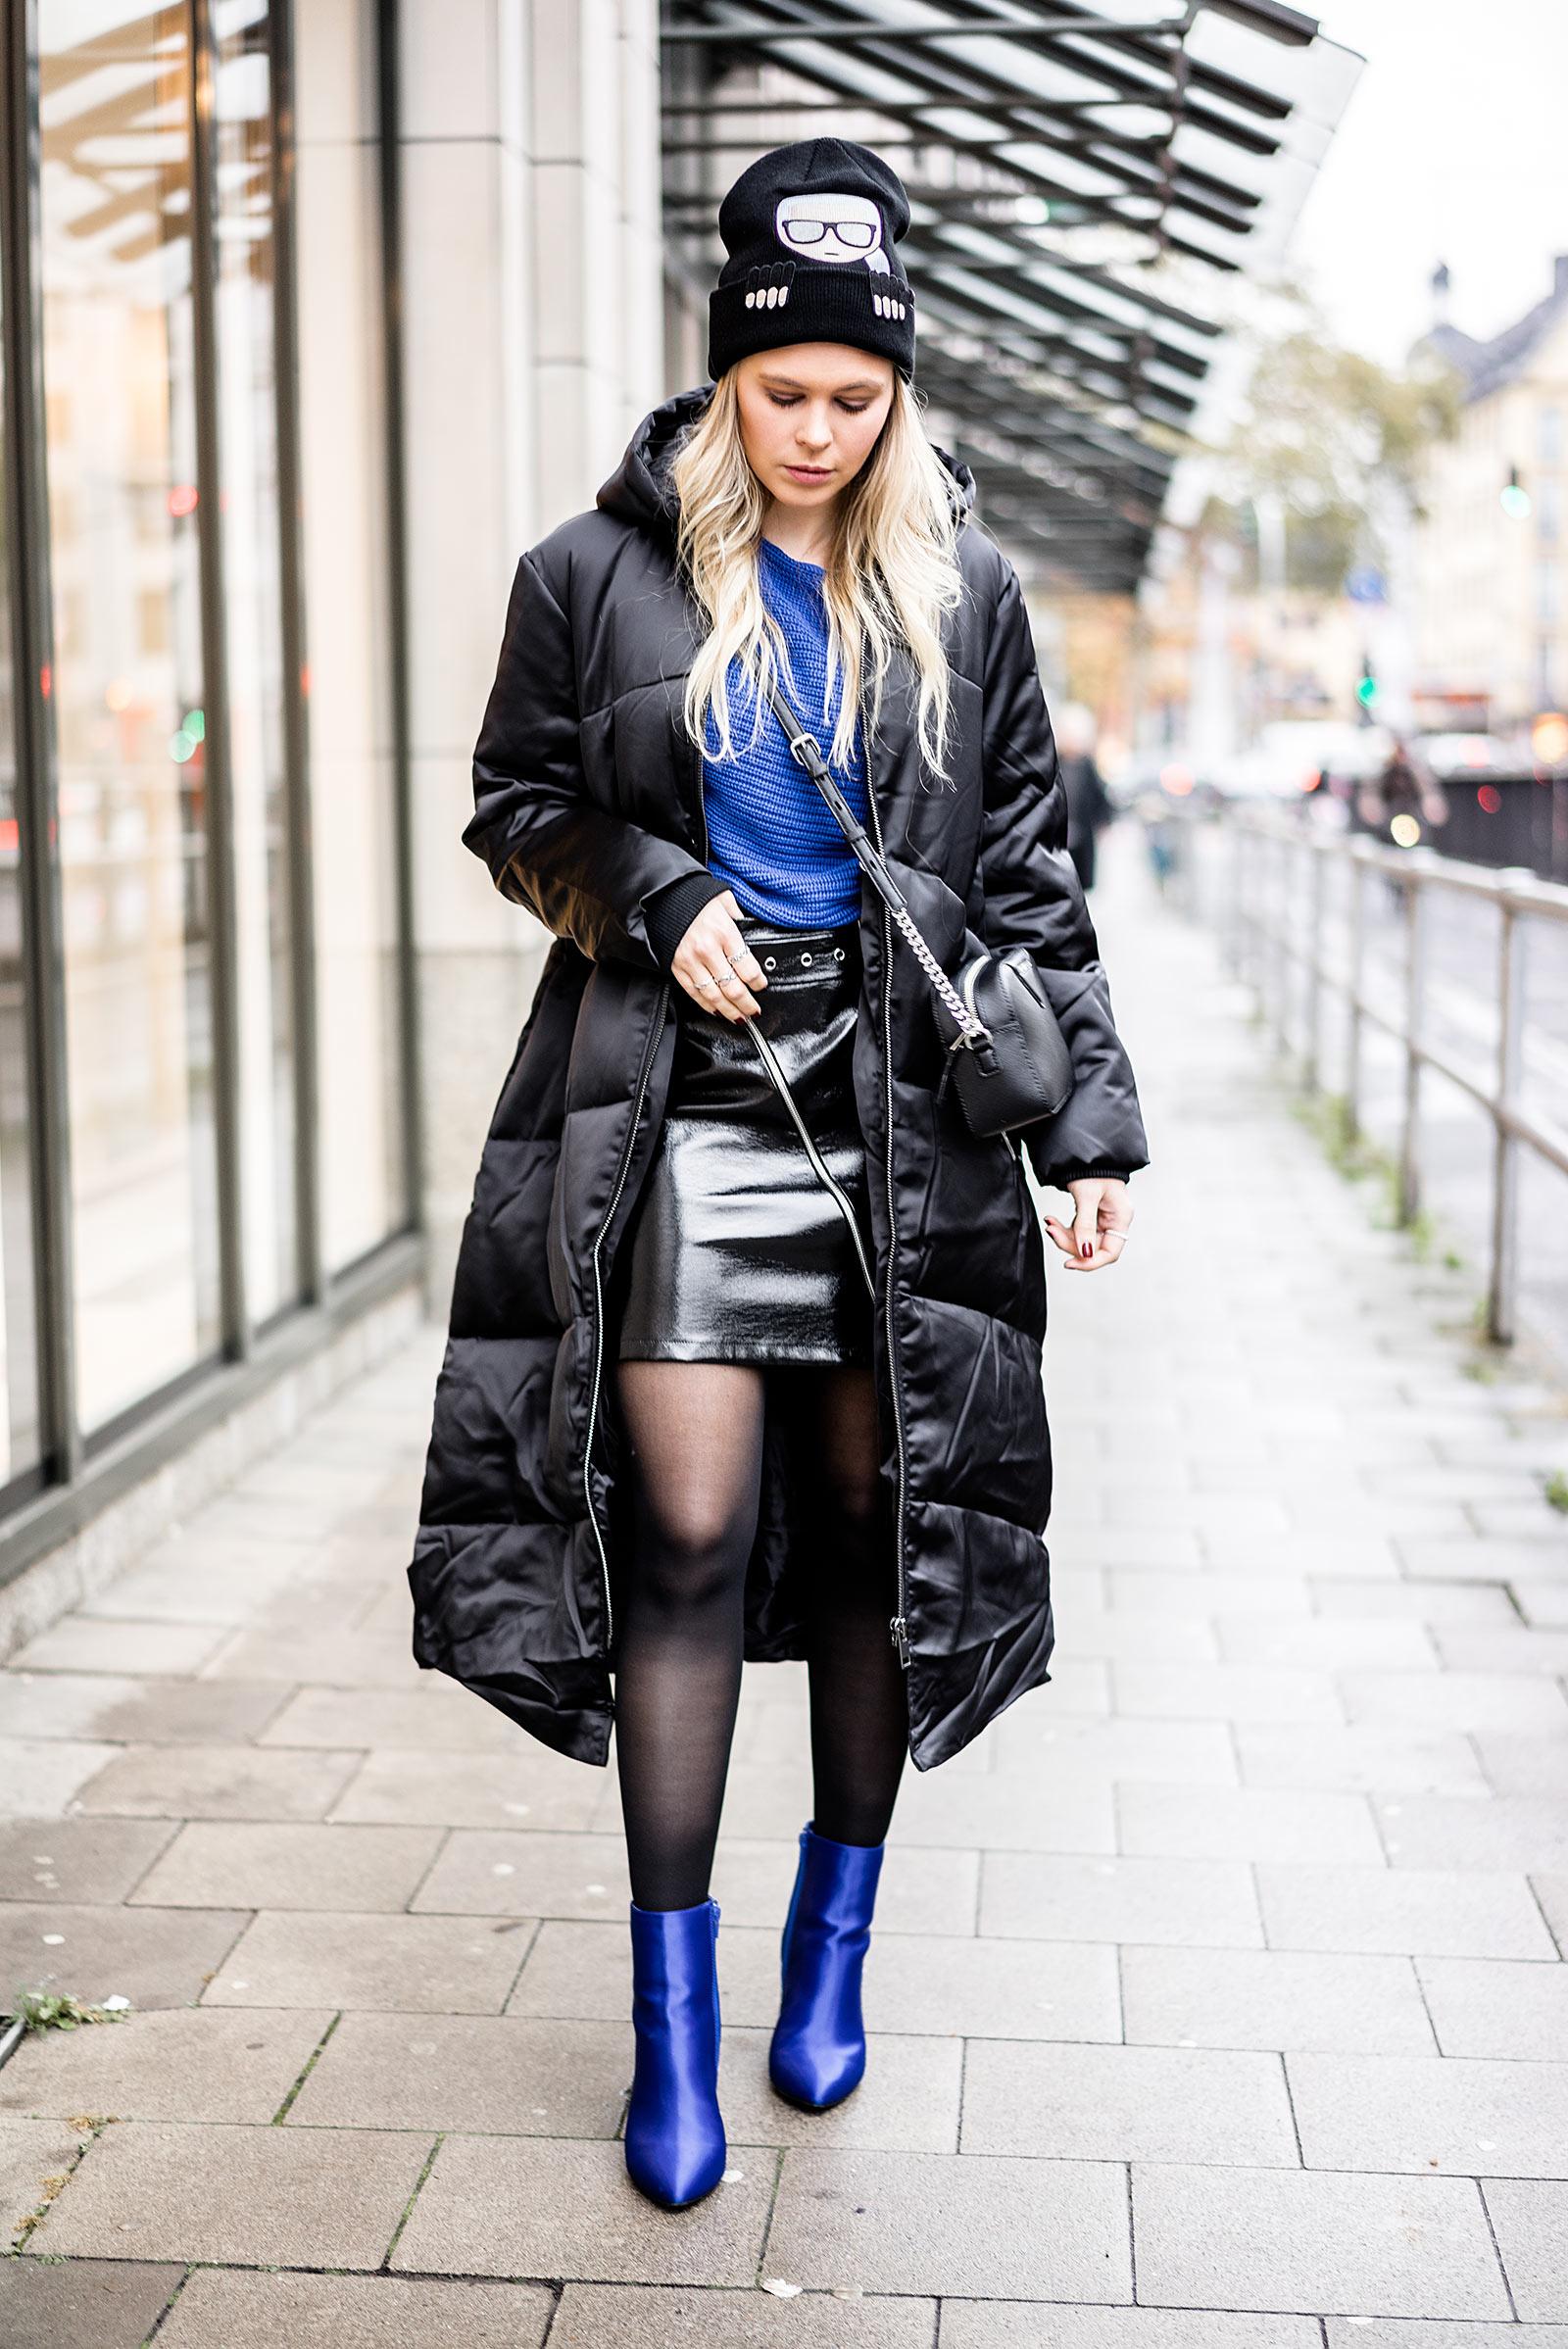 Sunnyinga Fashion Bloggerin Daunenmantel Outfit schwarz blau kombinieren